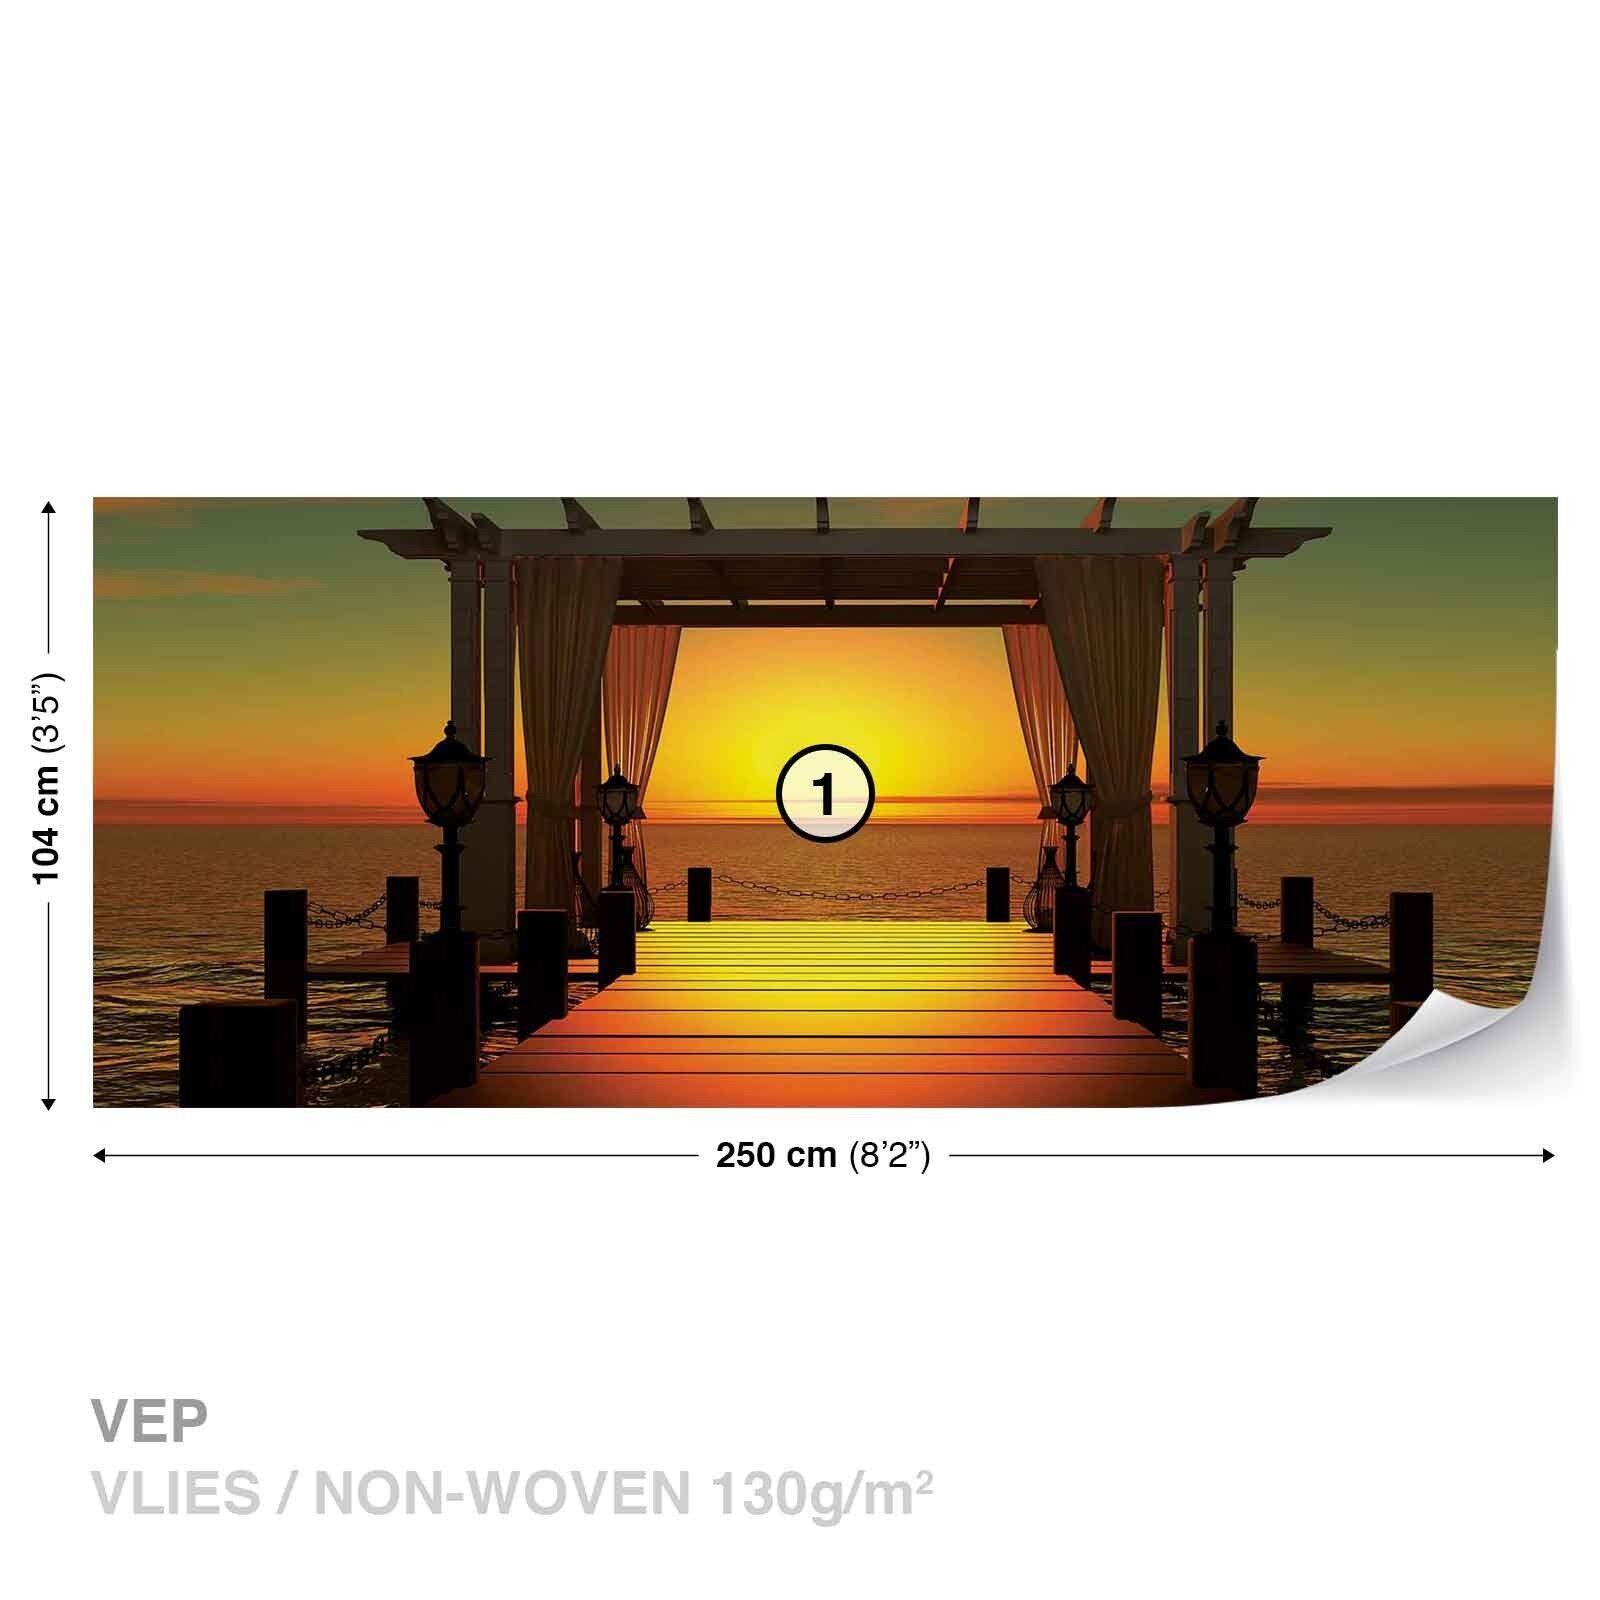 Design Design Design Tapete Vlies Fototapete Natur Landschaft Sonnenuntergang Steg am Meer 51351f